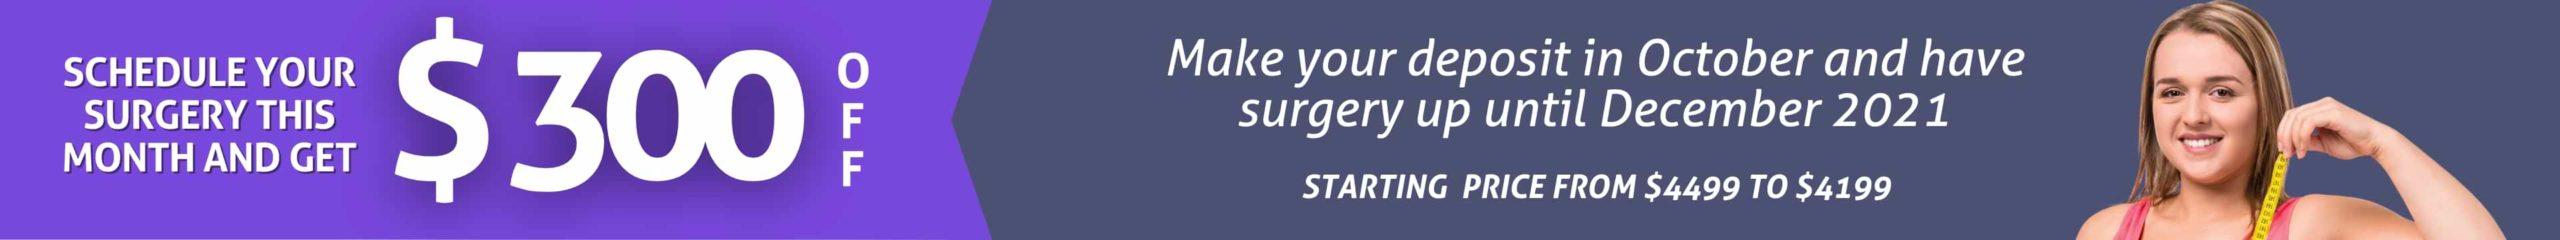 Weight loss surgery promo